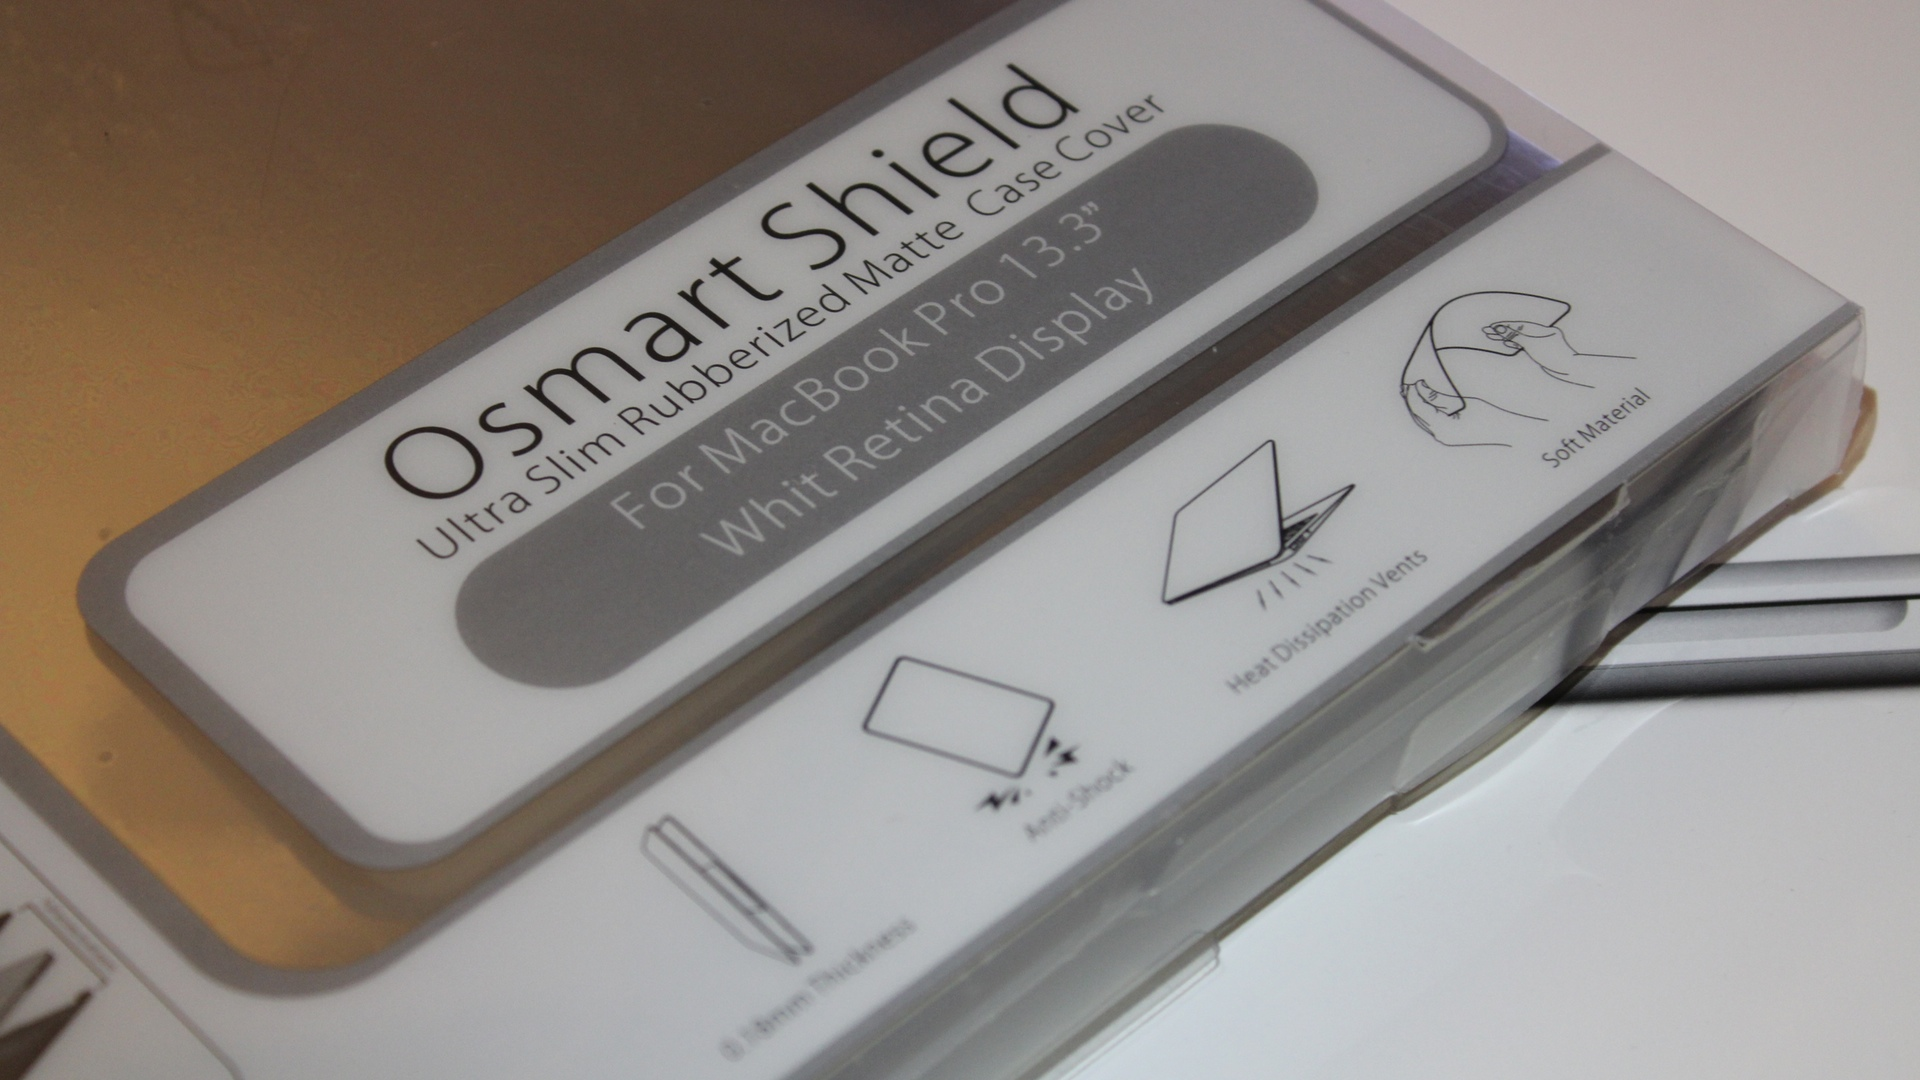 Osmart Shield MacBook Pro Whit Retina Display